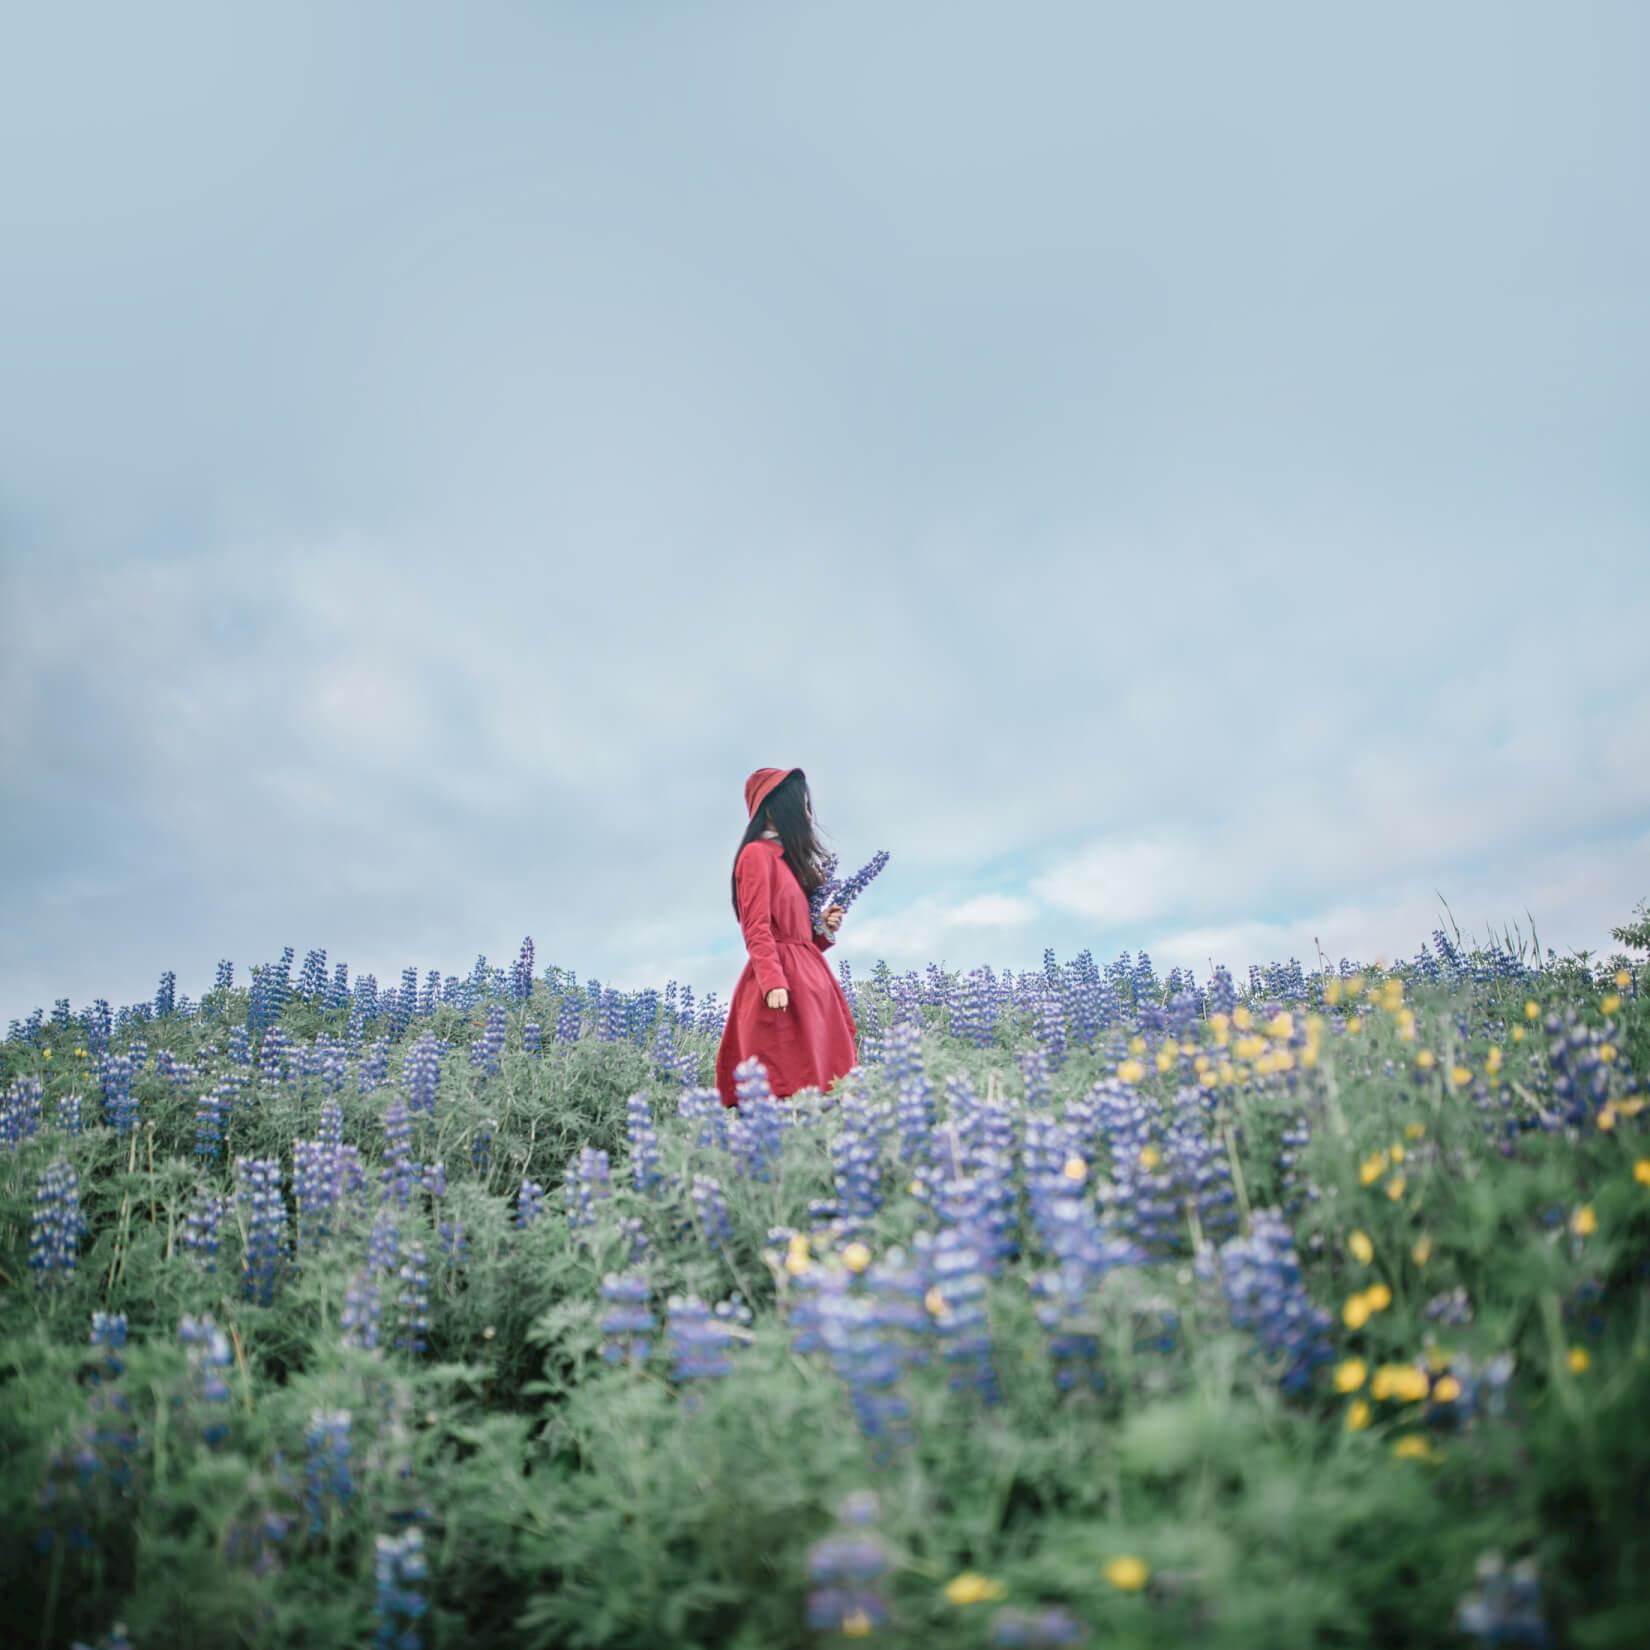 Sprazzi_Professional_Portrait_Photo_Iceland_Niki_Resize_19.jpg